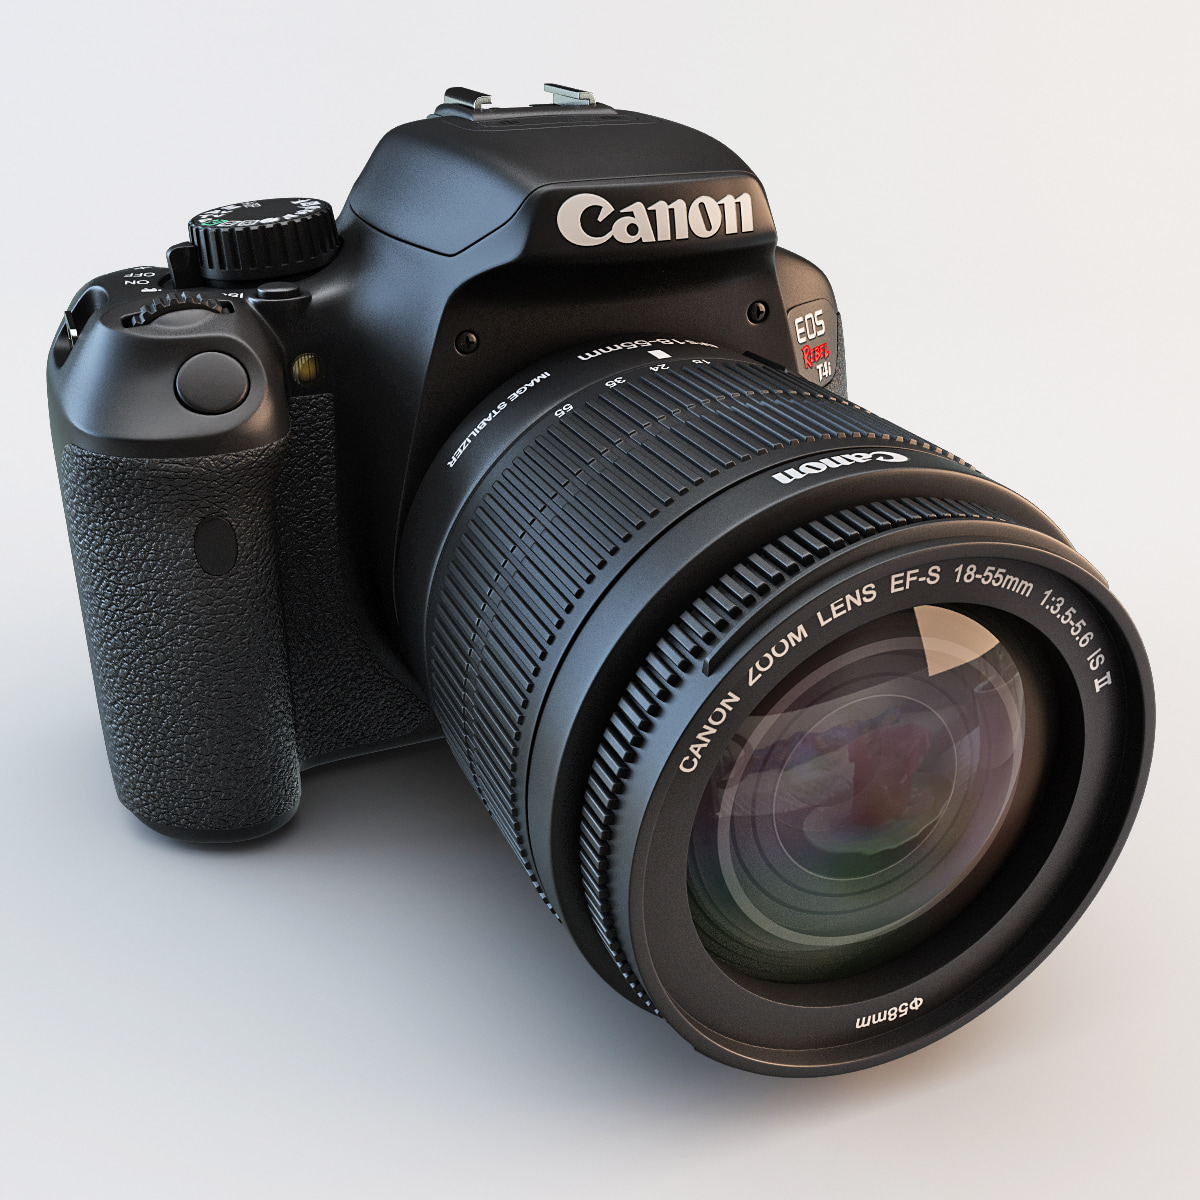 171880_Canon_EOS_Rebel_T4i_18-55mm_0001.jpg